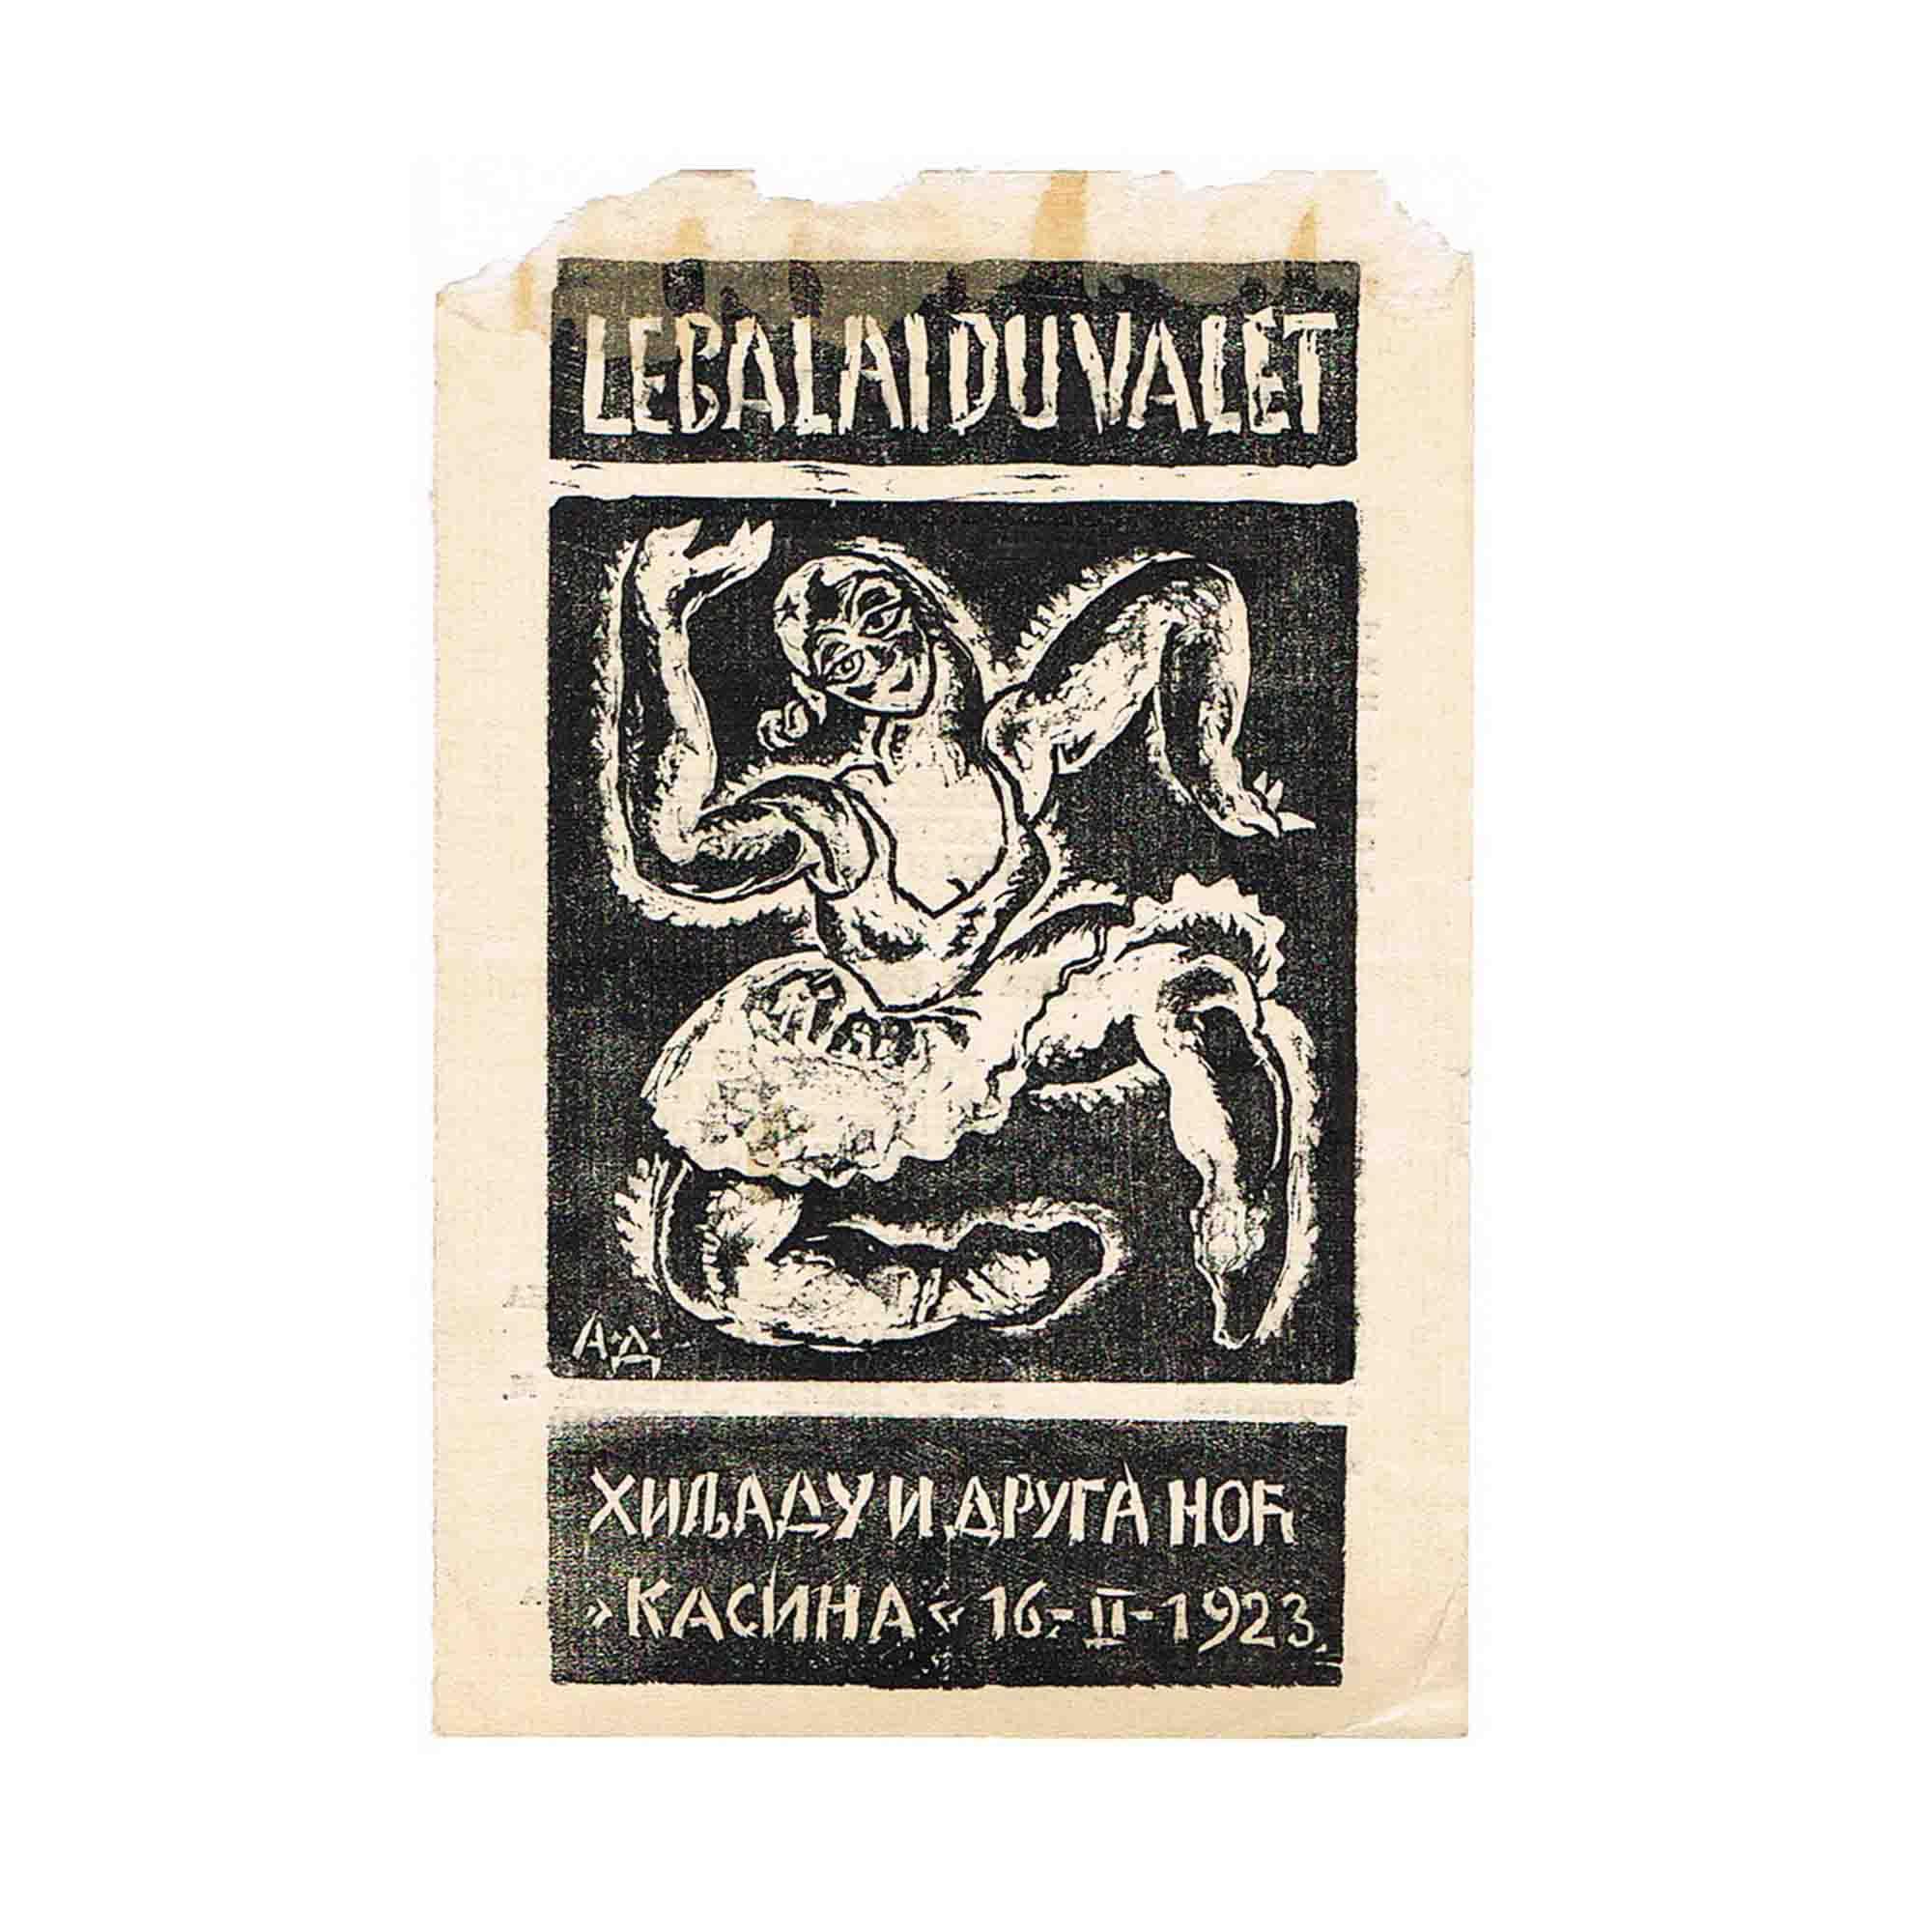 5080-Milojevic-Ristic-Balai-Programm-1923-1-N.jpeg